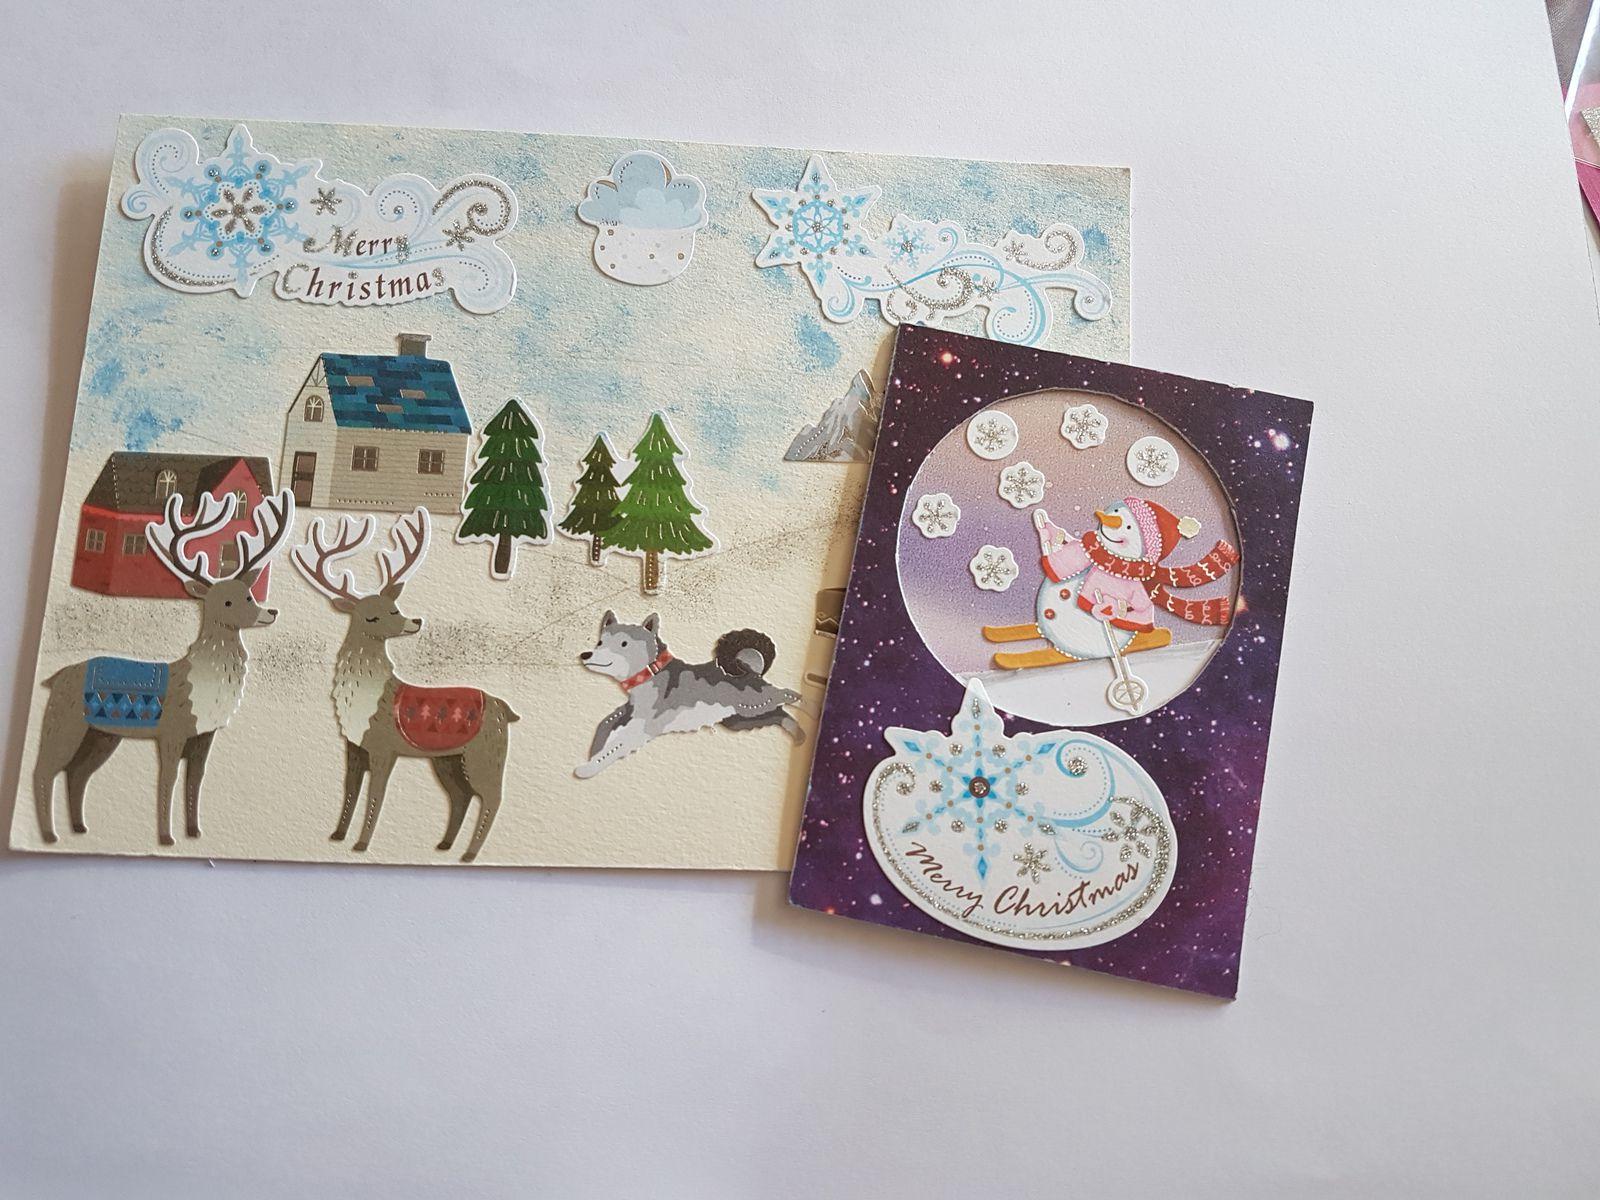 du gentil et joli courrier (1)